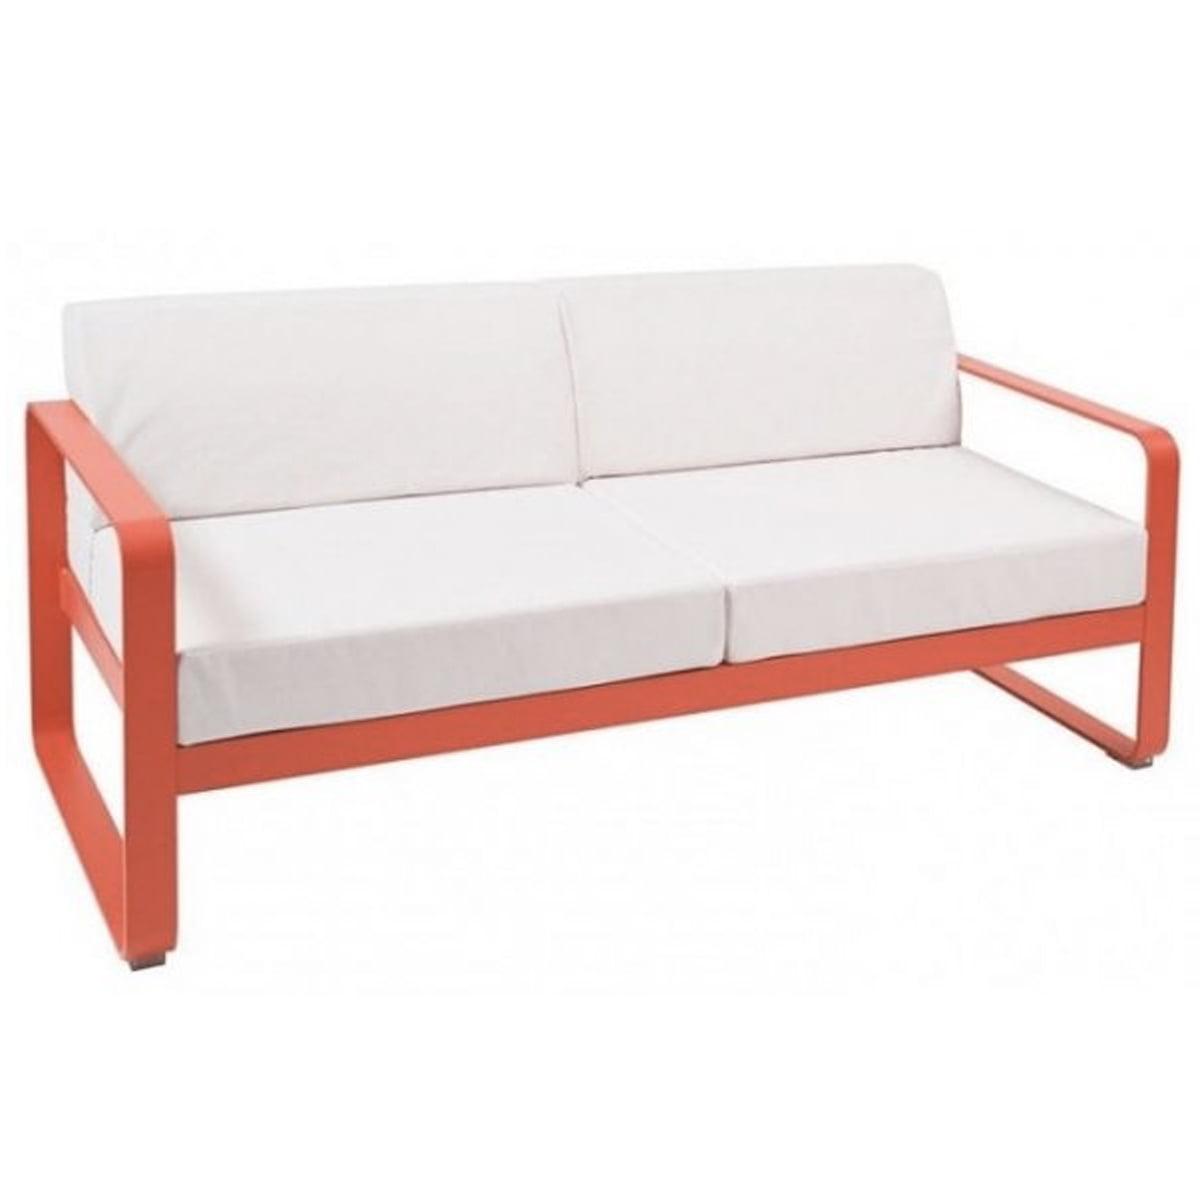 neo 100703e indoor outdoor metal frame sofa set